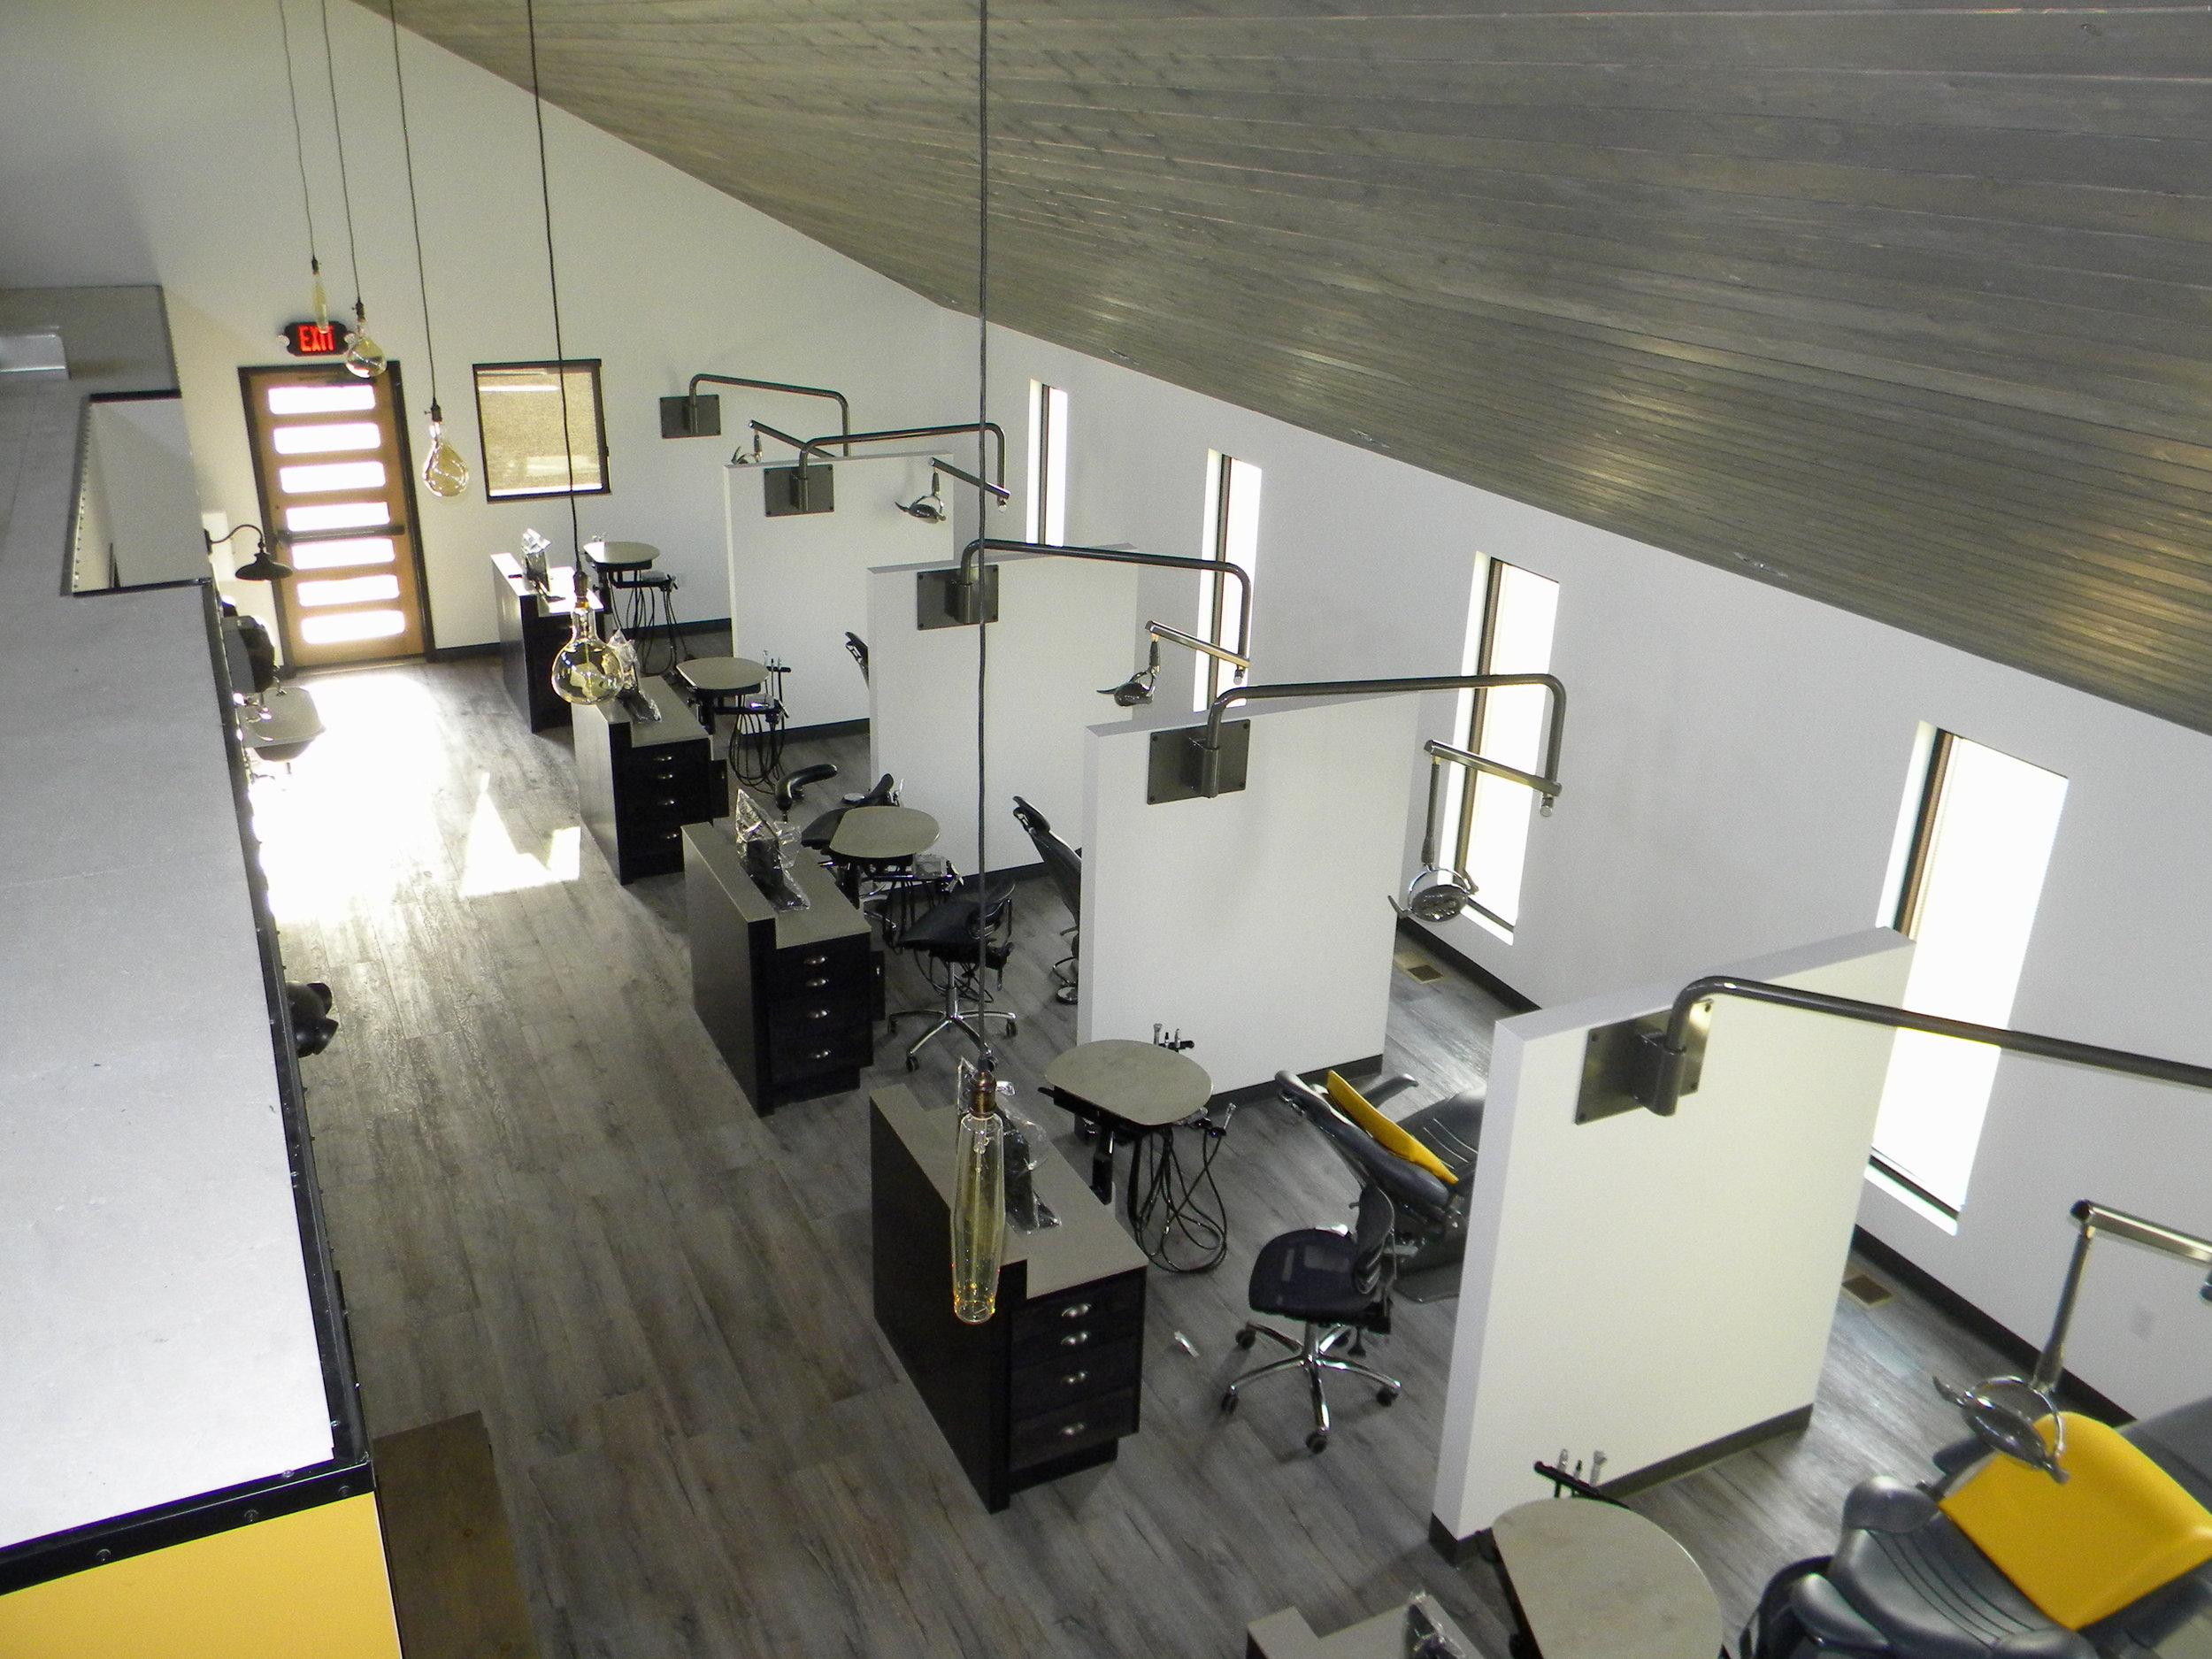 Waschak Dentist Office Grants Pass, Oregon Heiland Hoff Architecture Project Architect: Heiland Hoff